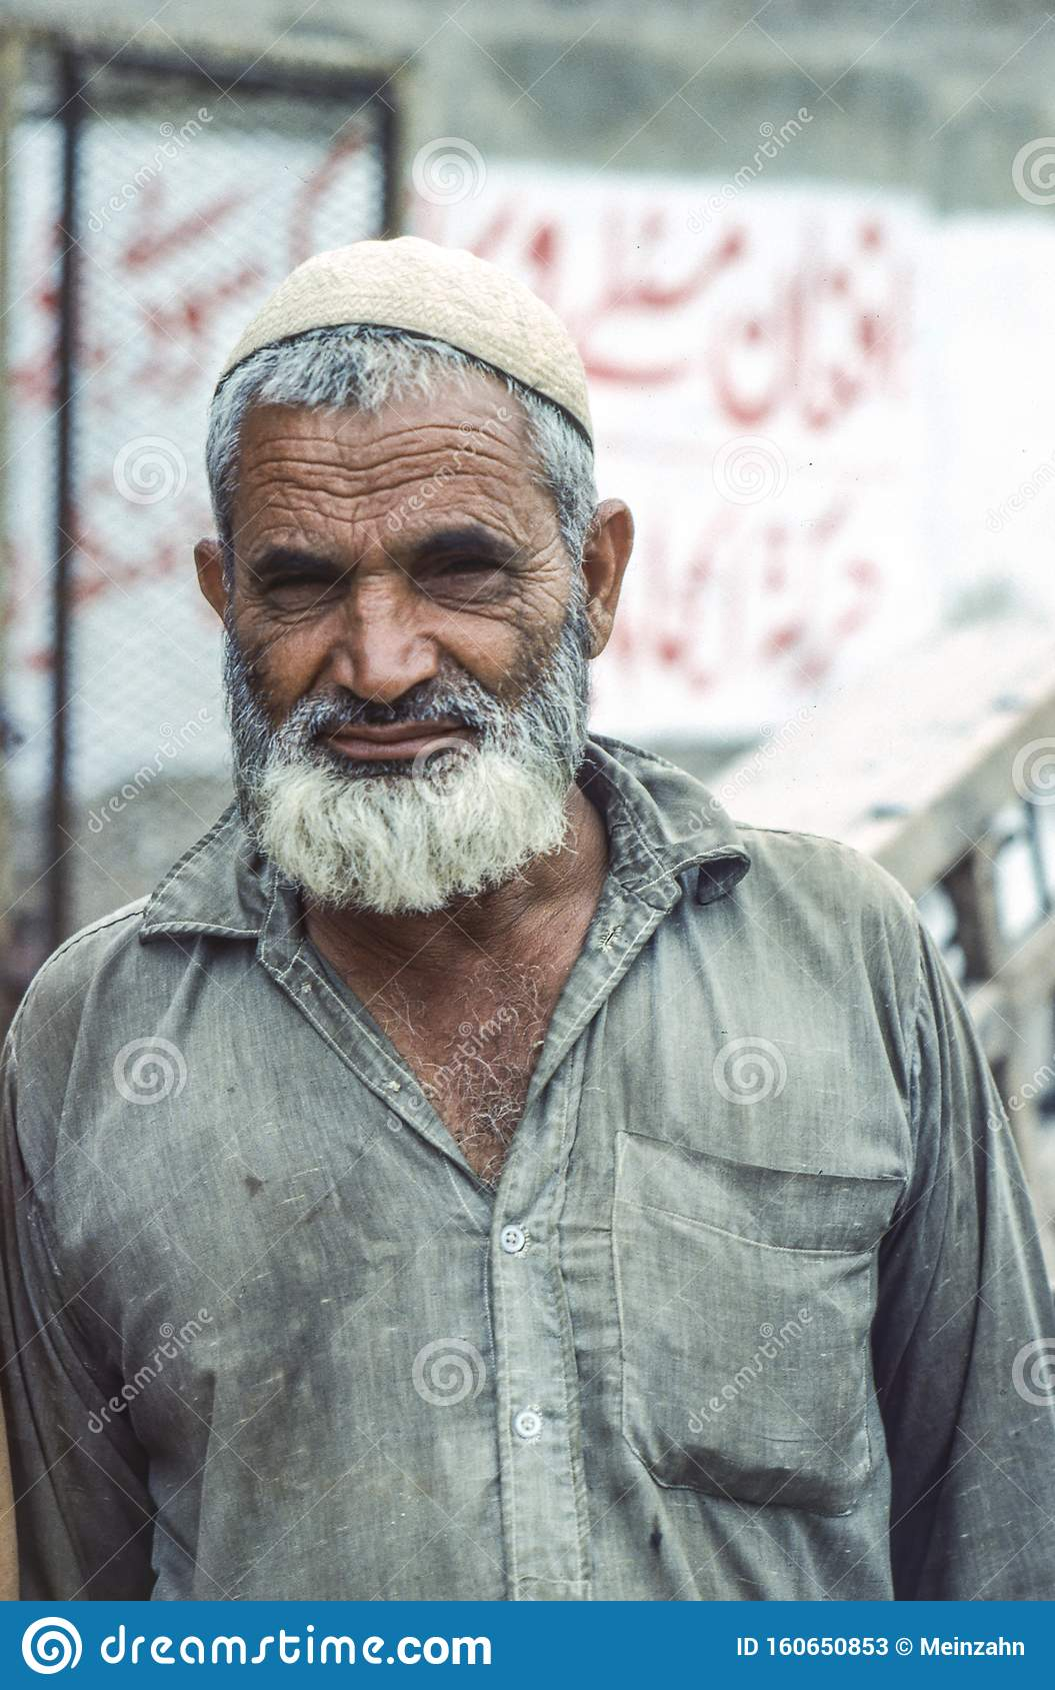 Man pakistani gay old Shahrag, the